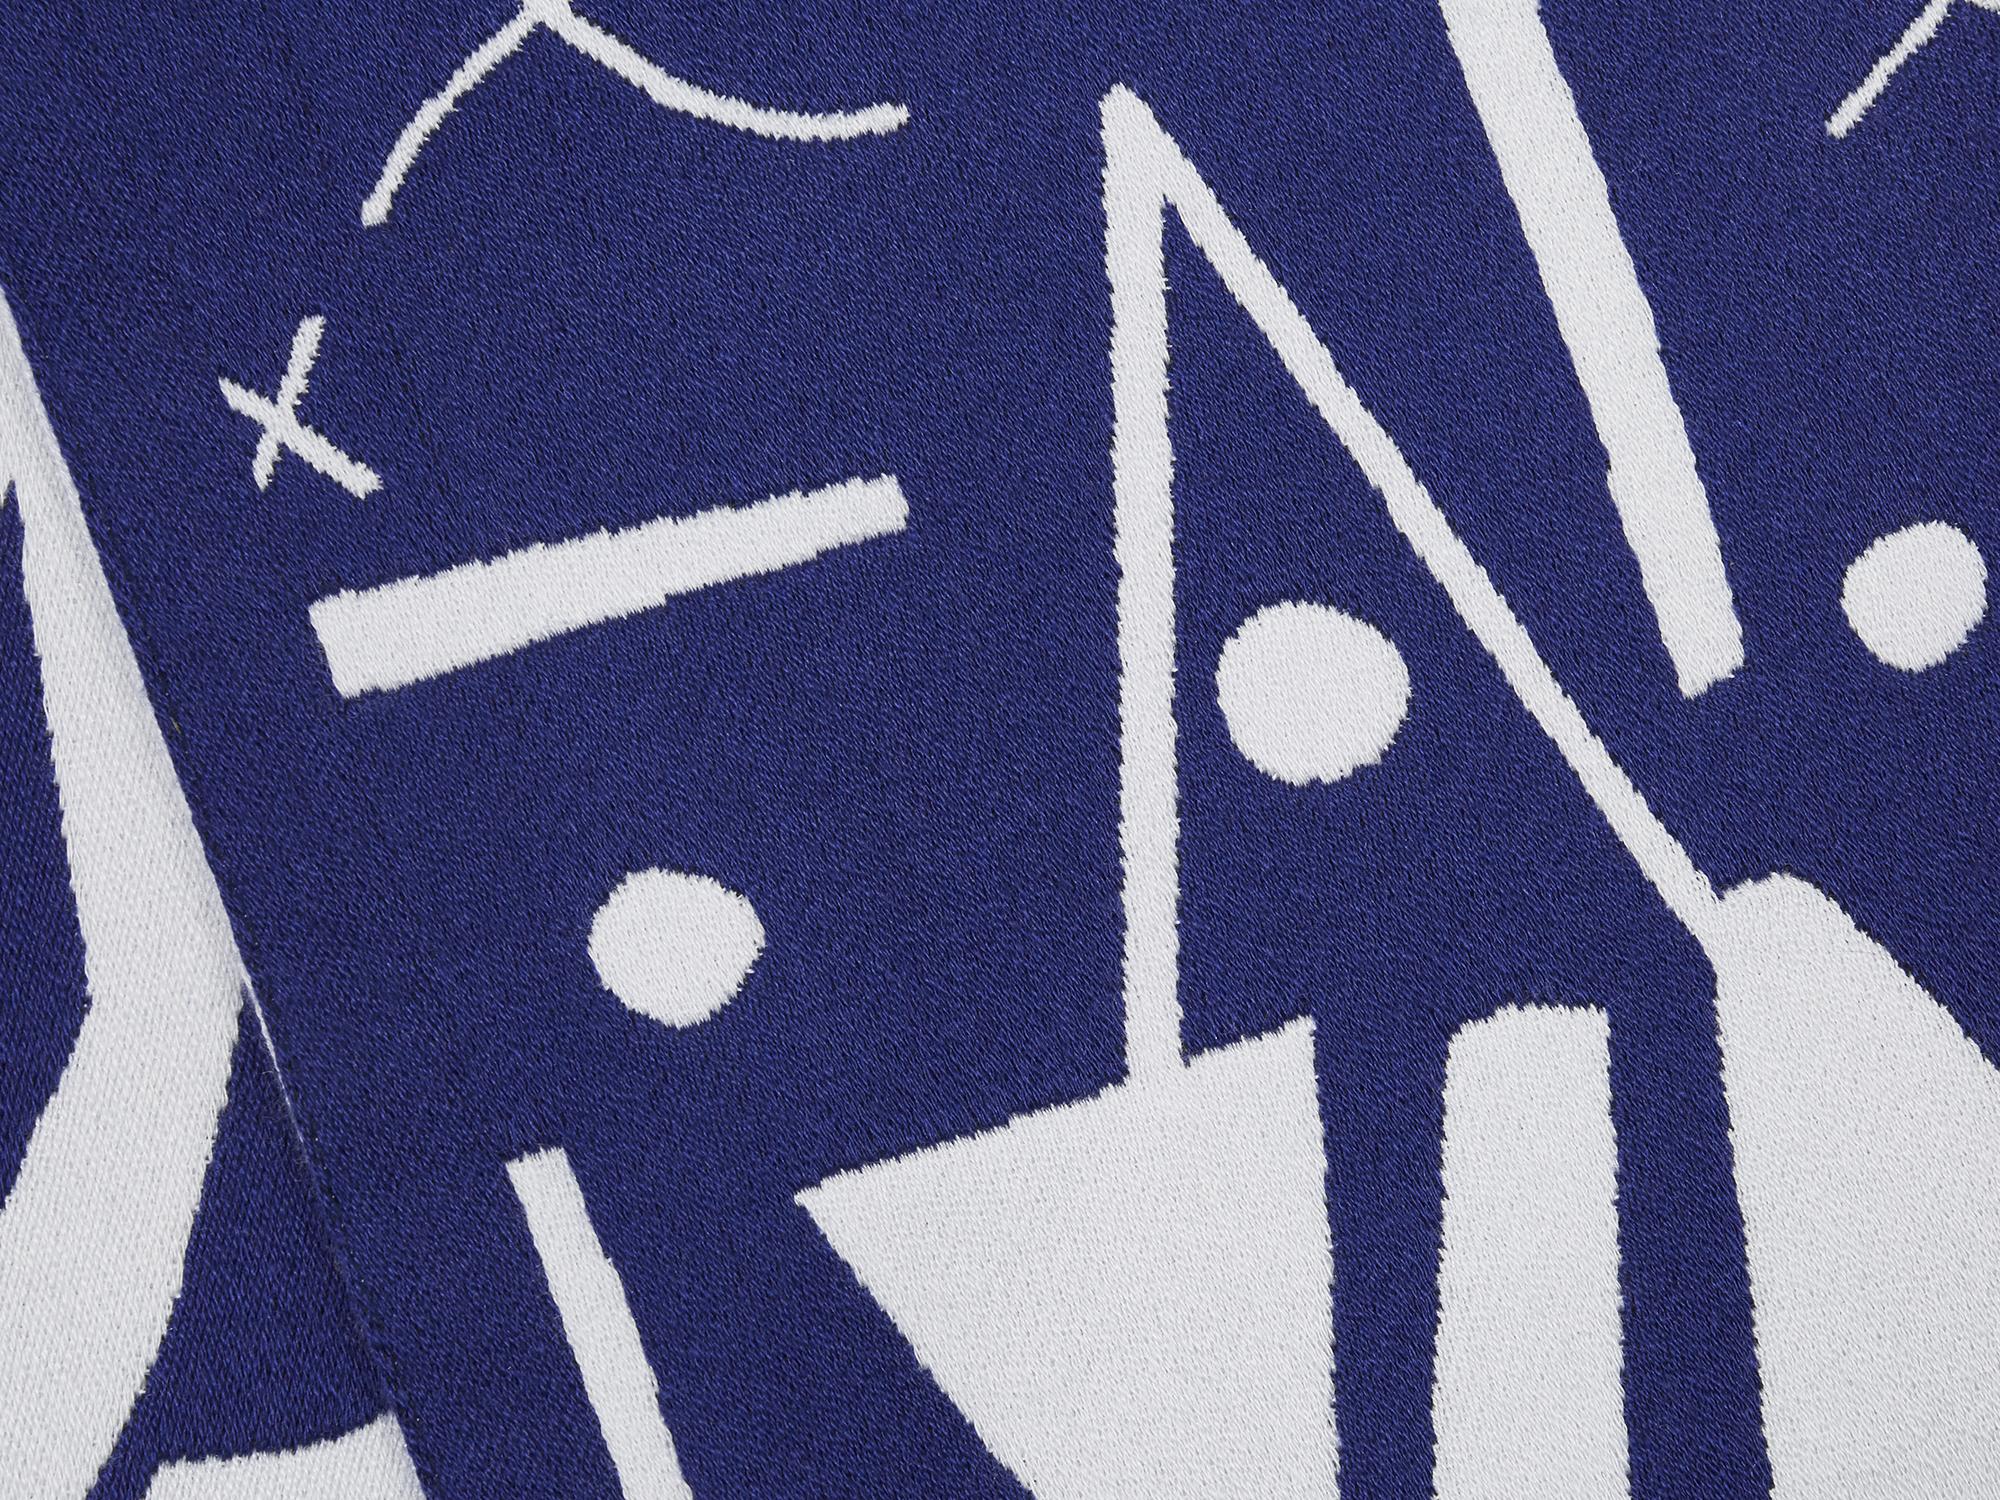 ITEM-16_BLUE_03.jpg